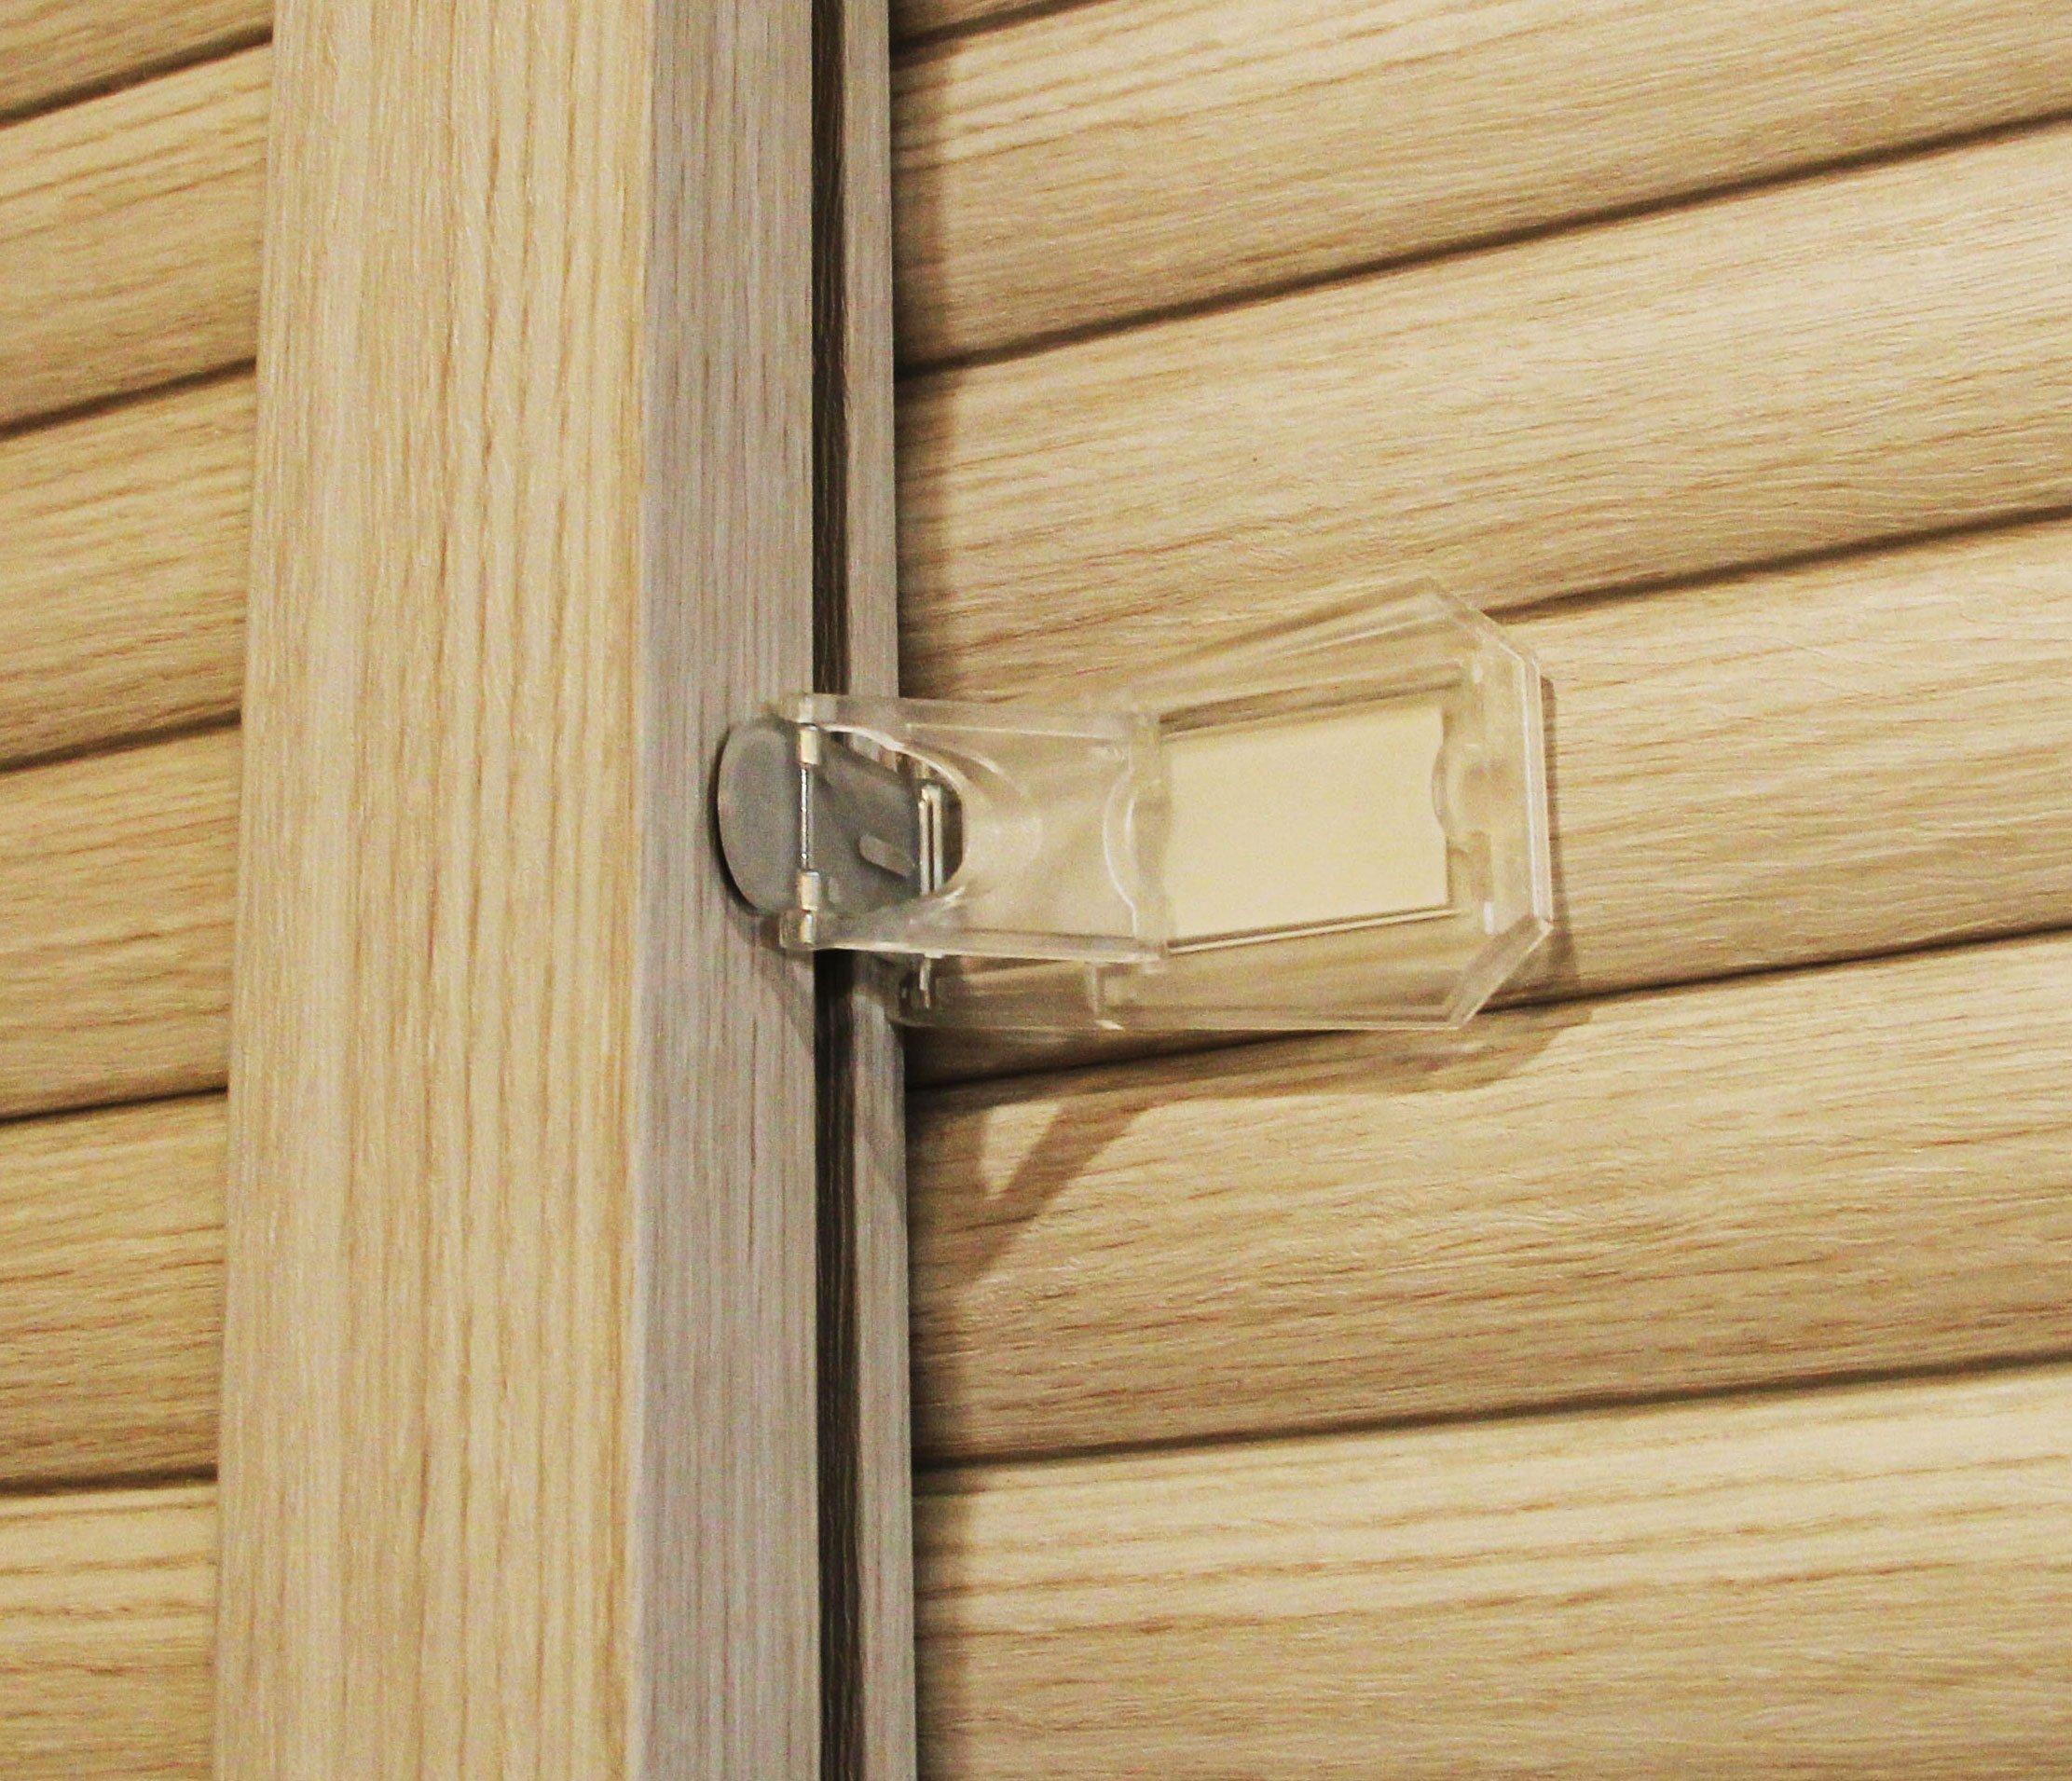 Cheap Sliding Door Child Lock Find Sliding Door Child Lock Deals On